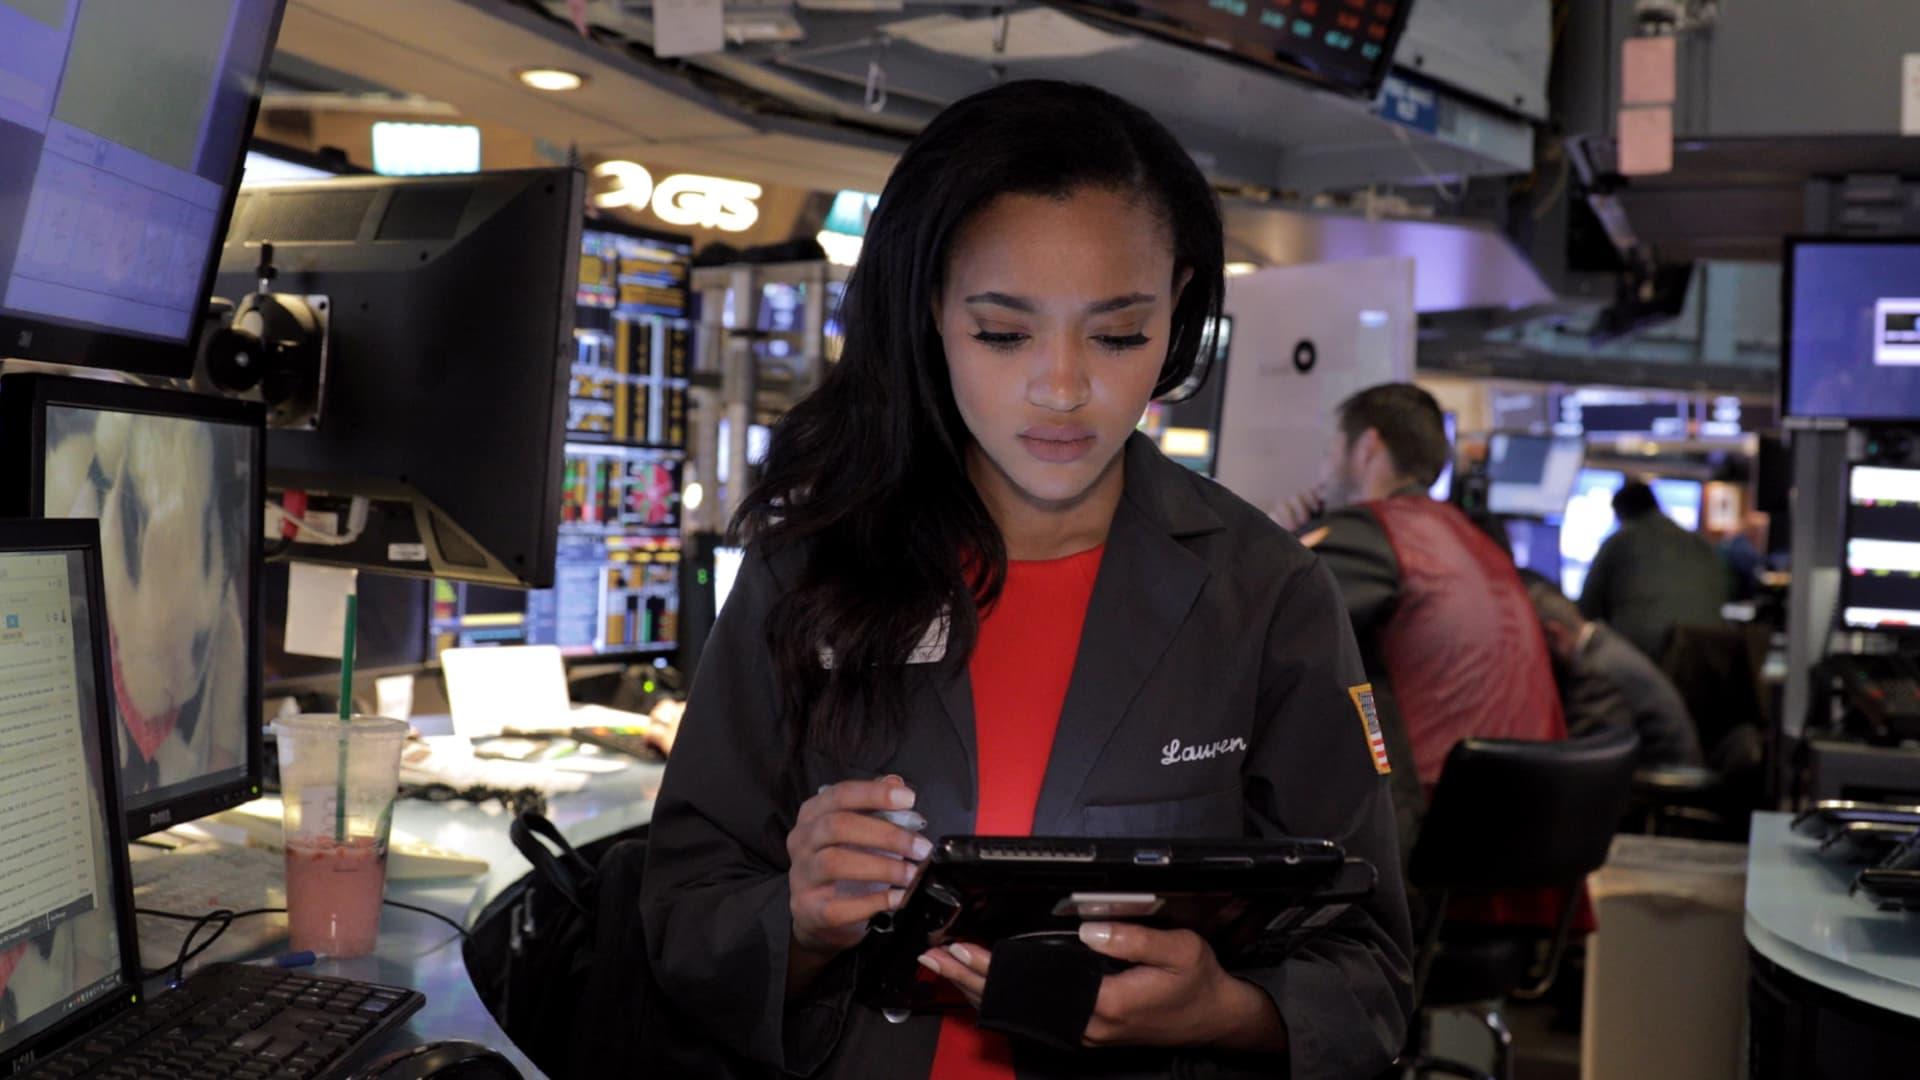 NYSE trader/broker Lauren Simmons